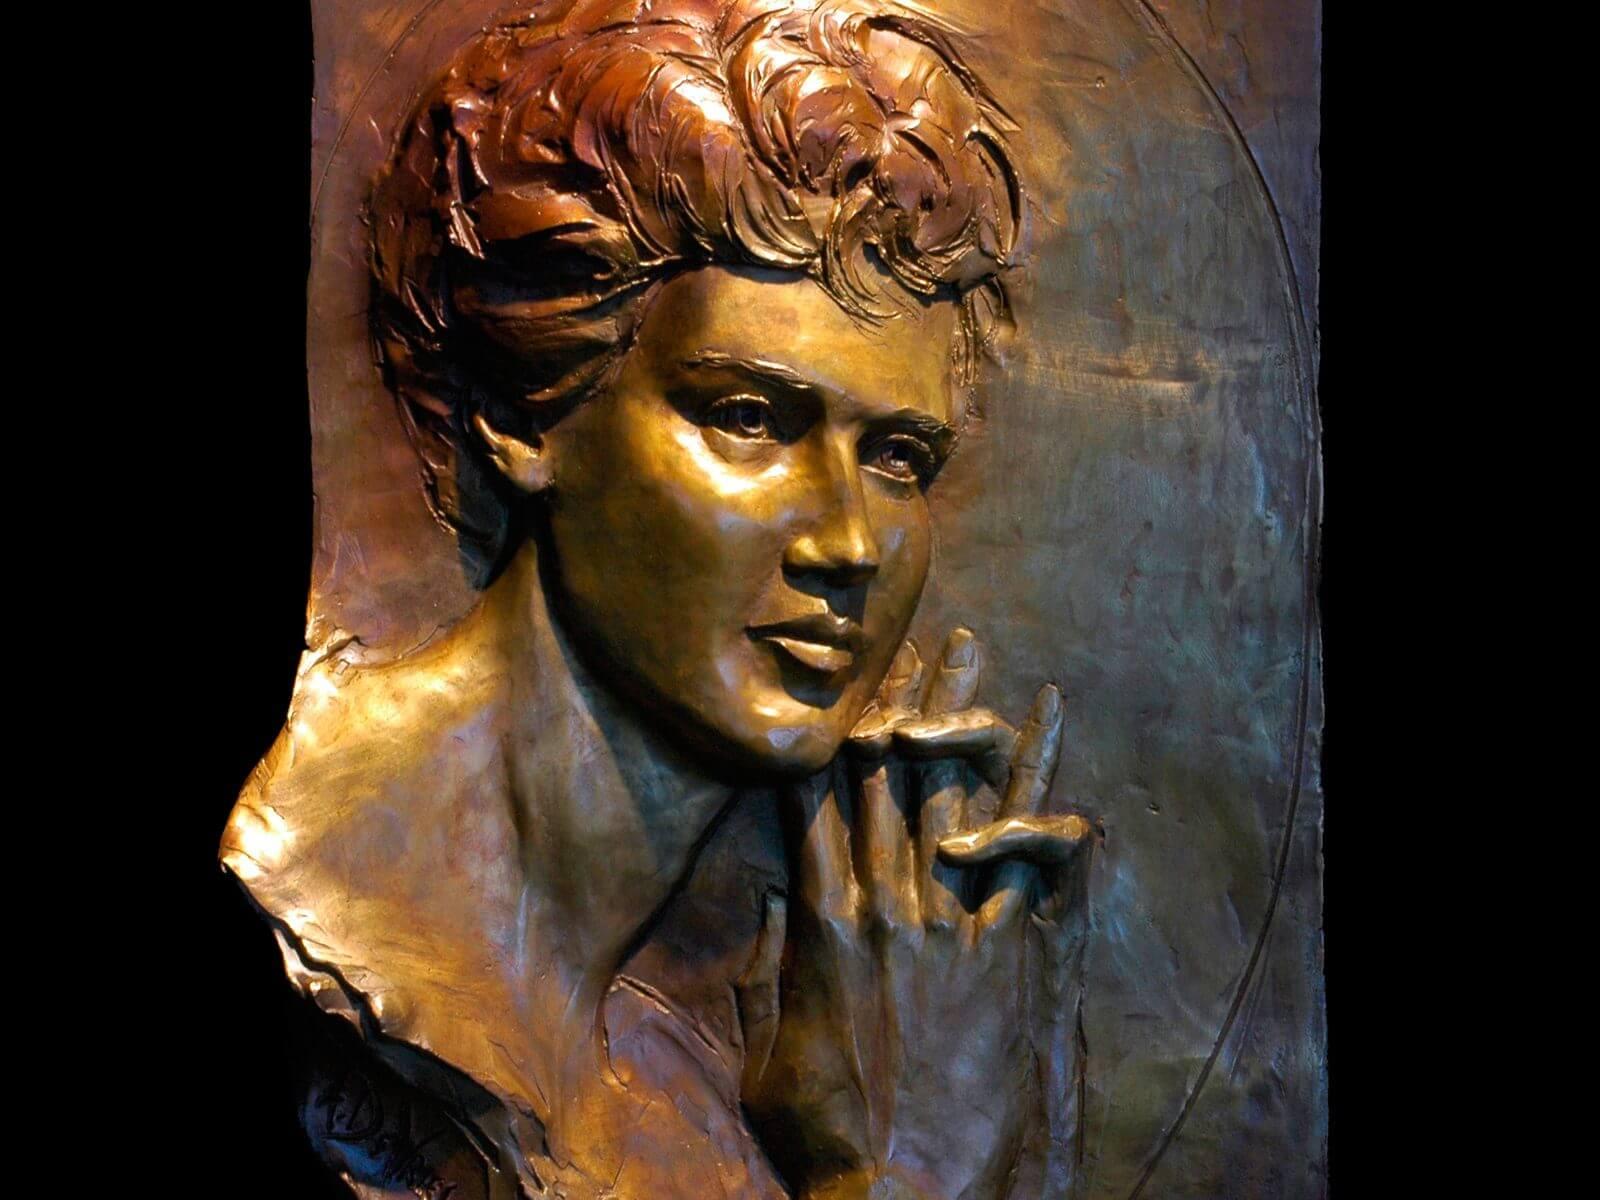 Roberta Mae Rudin portrait in bronze by Andrew DeVries installed at Bouvier Insurance West Hartford, CT